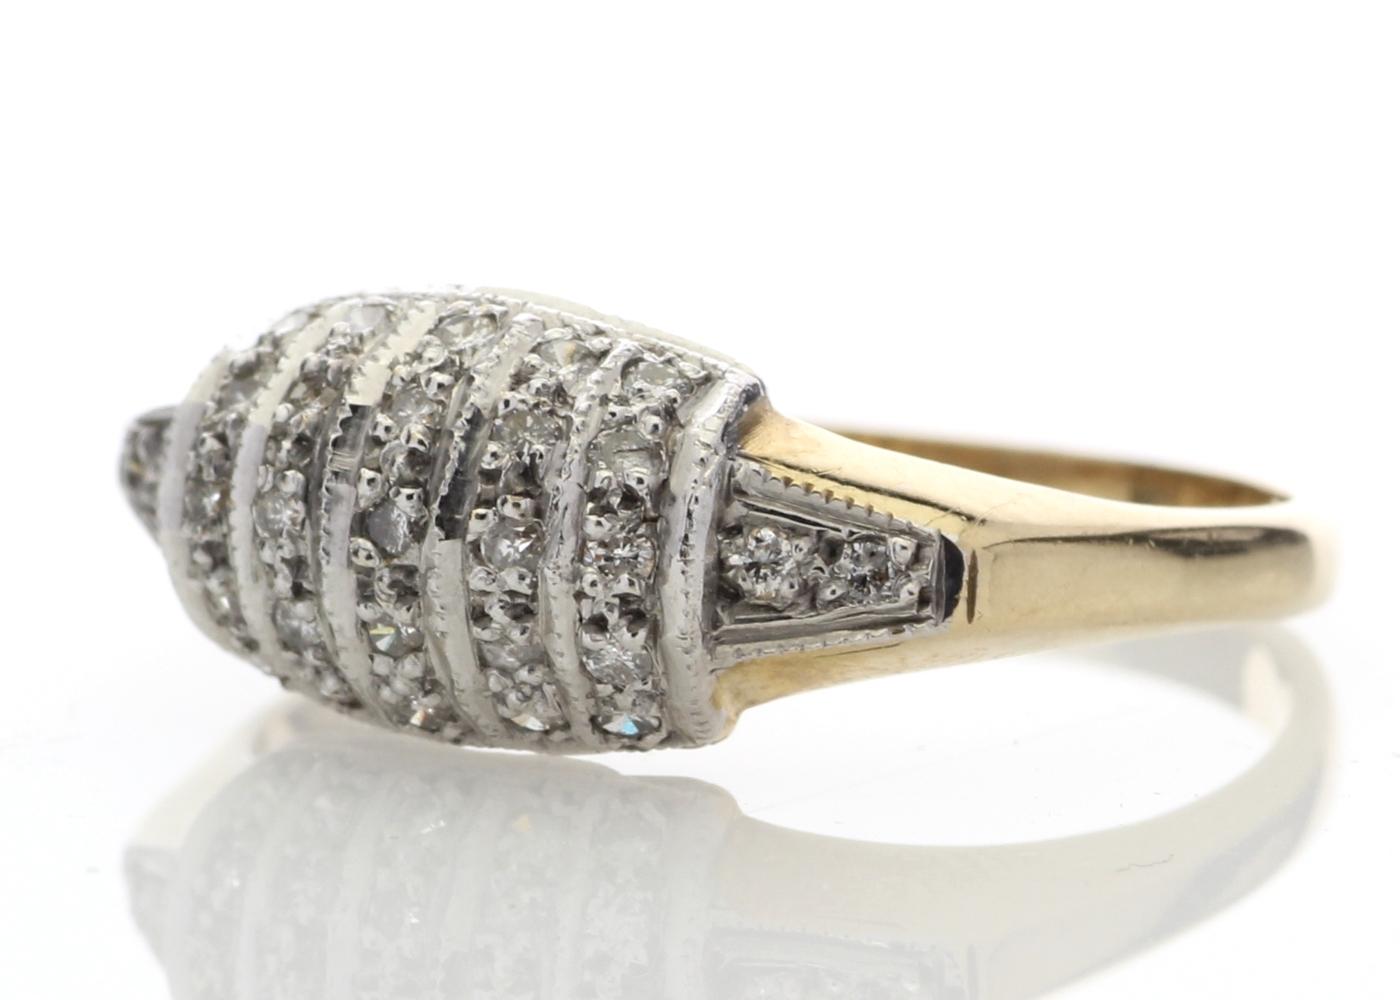 9ct Ladies Dress Diamond Ring 0.29 Carats - Image 2 of 4